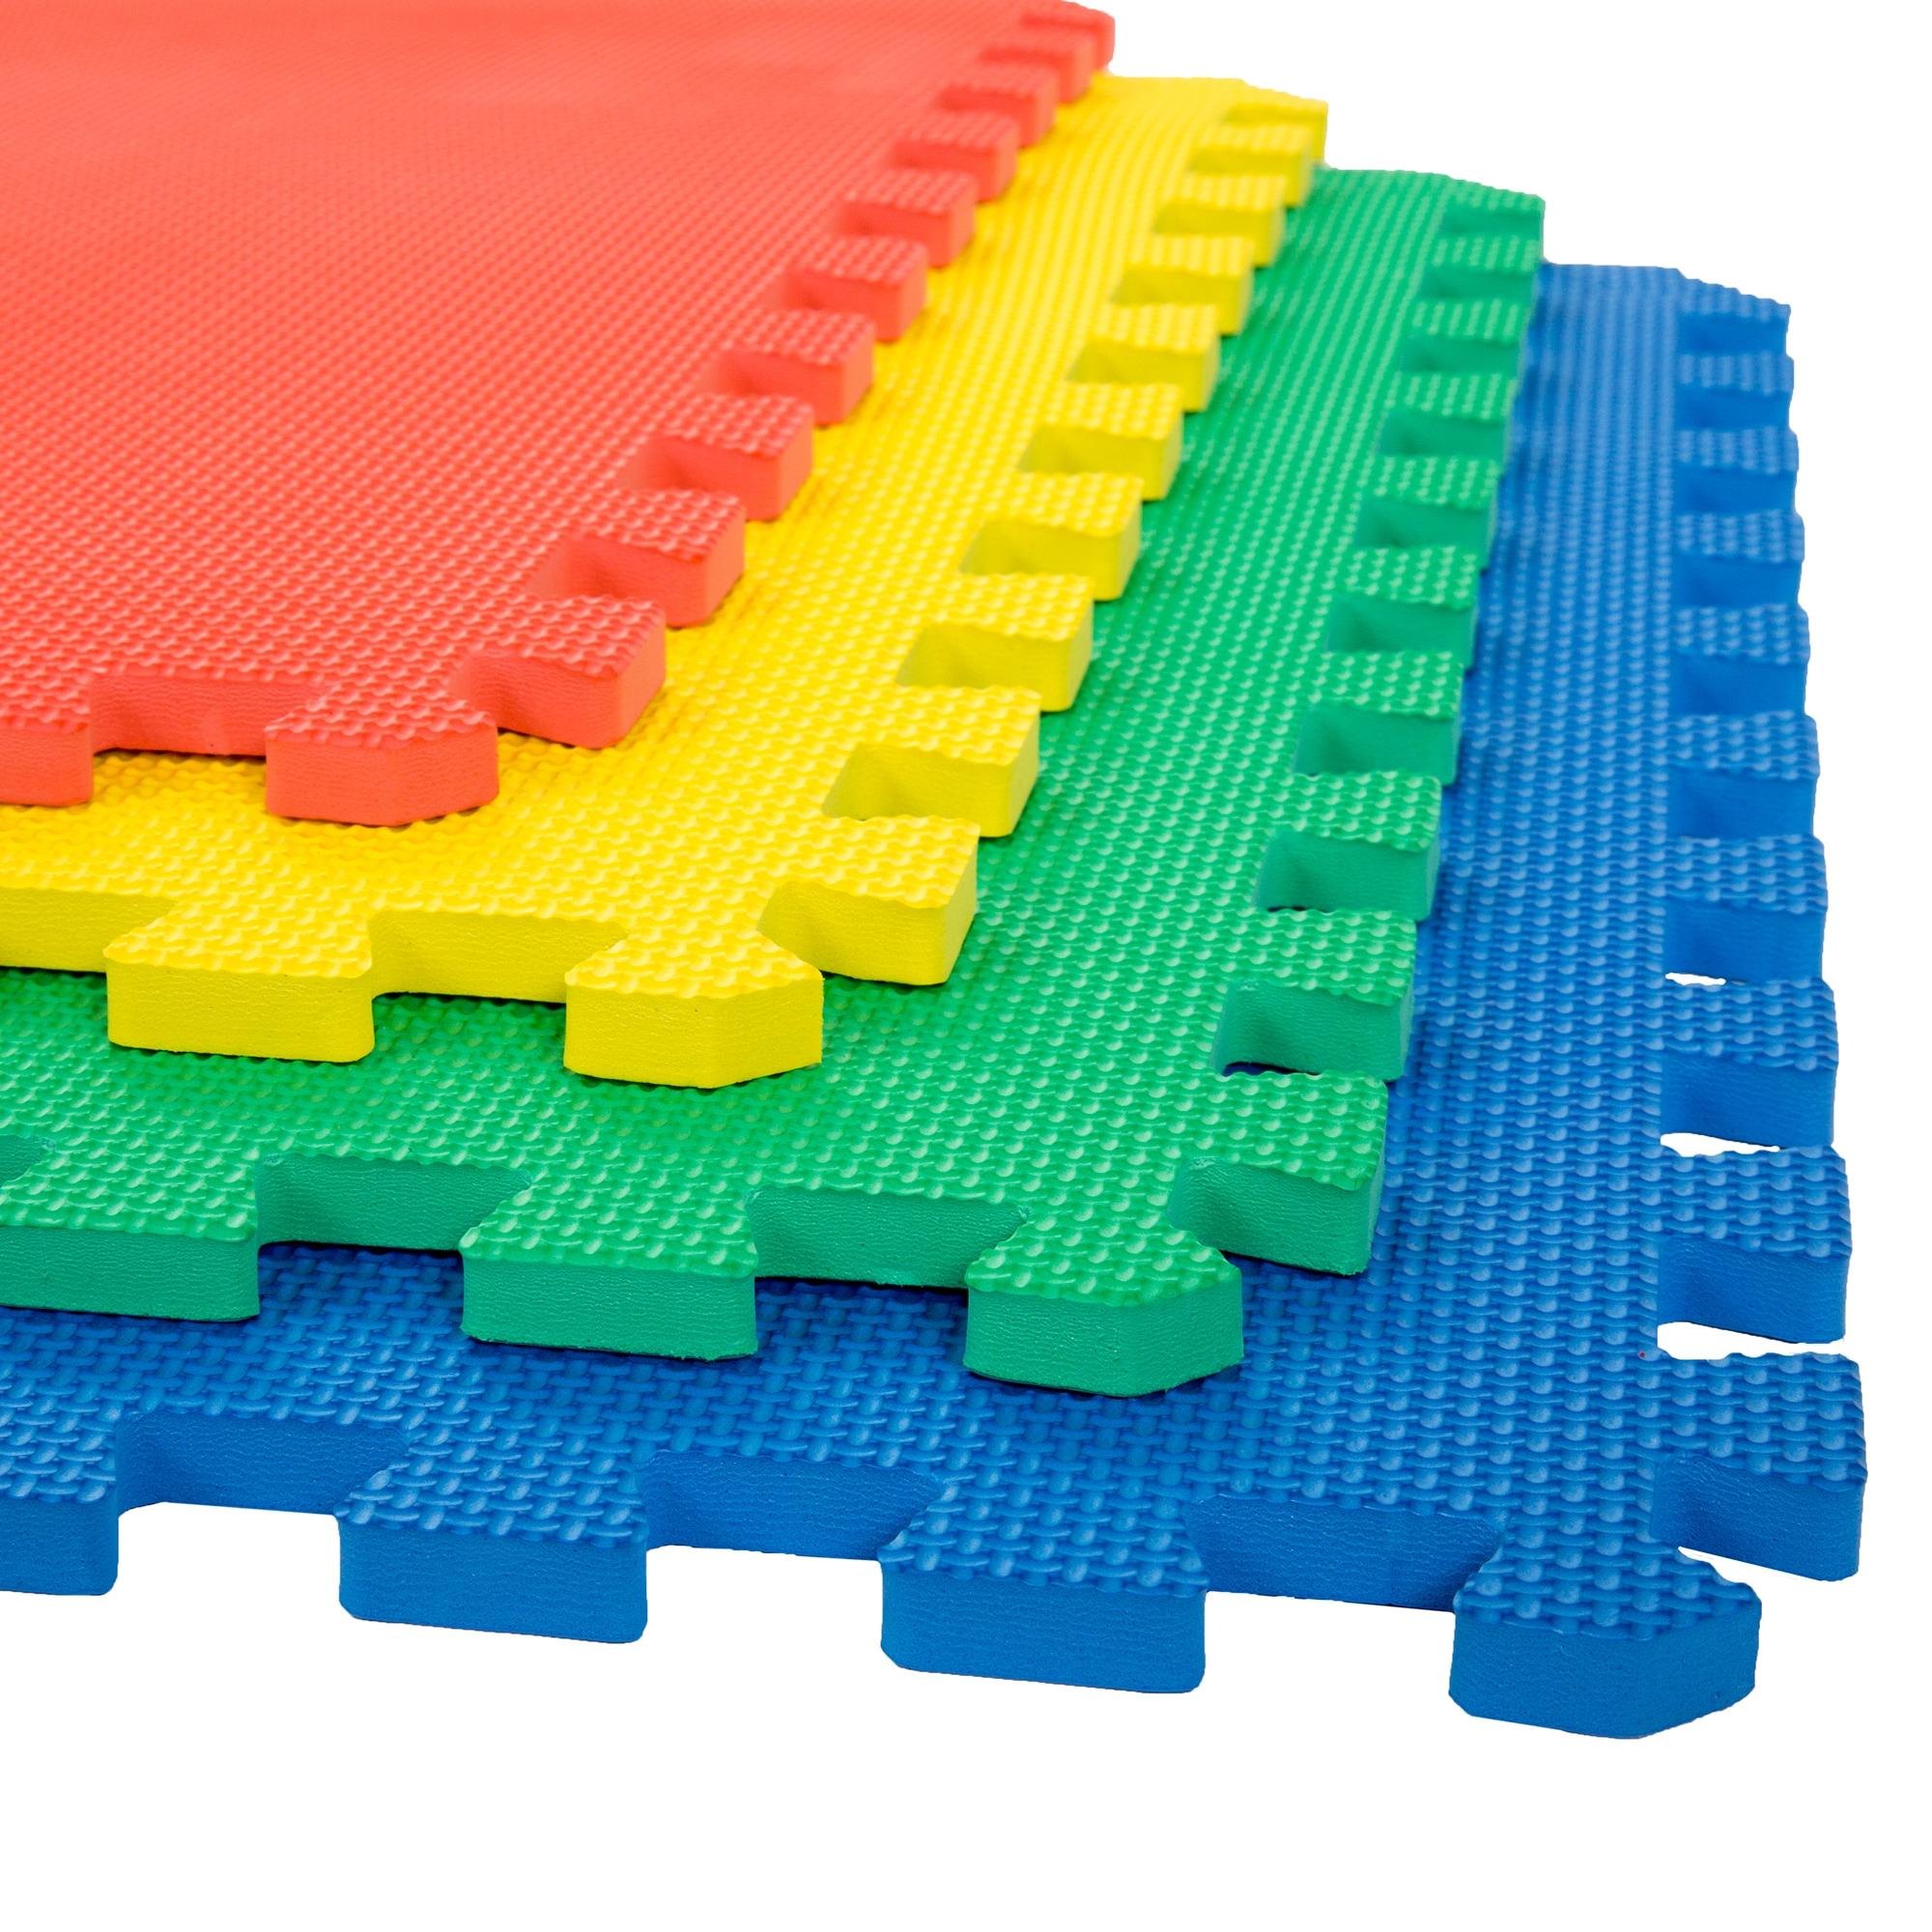 duty babies fresh capable rubber for grain mats idea like of floor costco looks interlocking mat recycled size tiles ez foam heavy wood lowes flooring that full flex tile